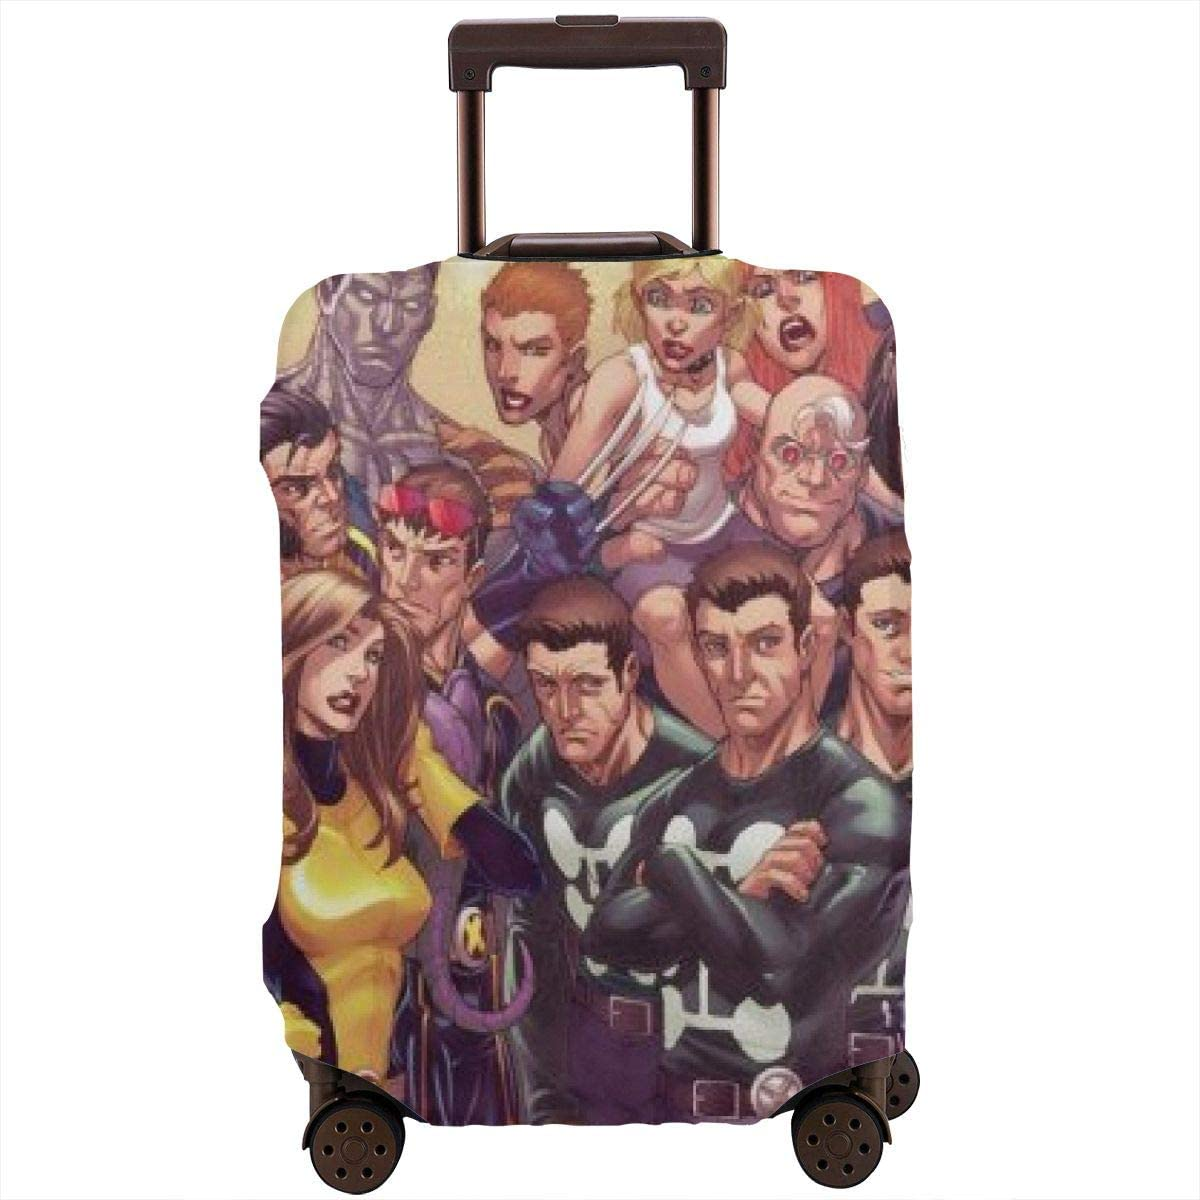 Superhero Comics Xmen Suitcase Protector Travel Luggage Cover Fit